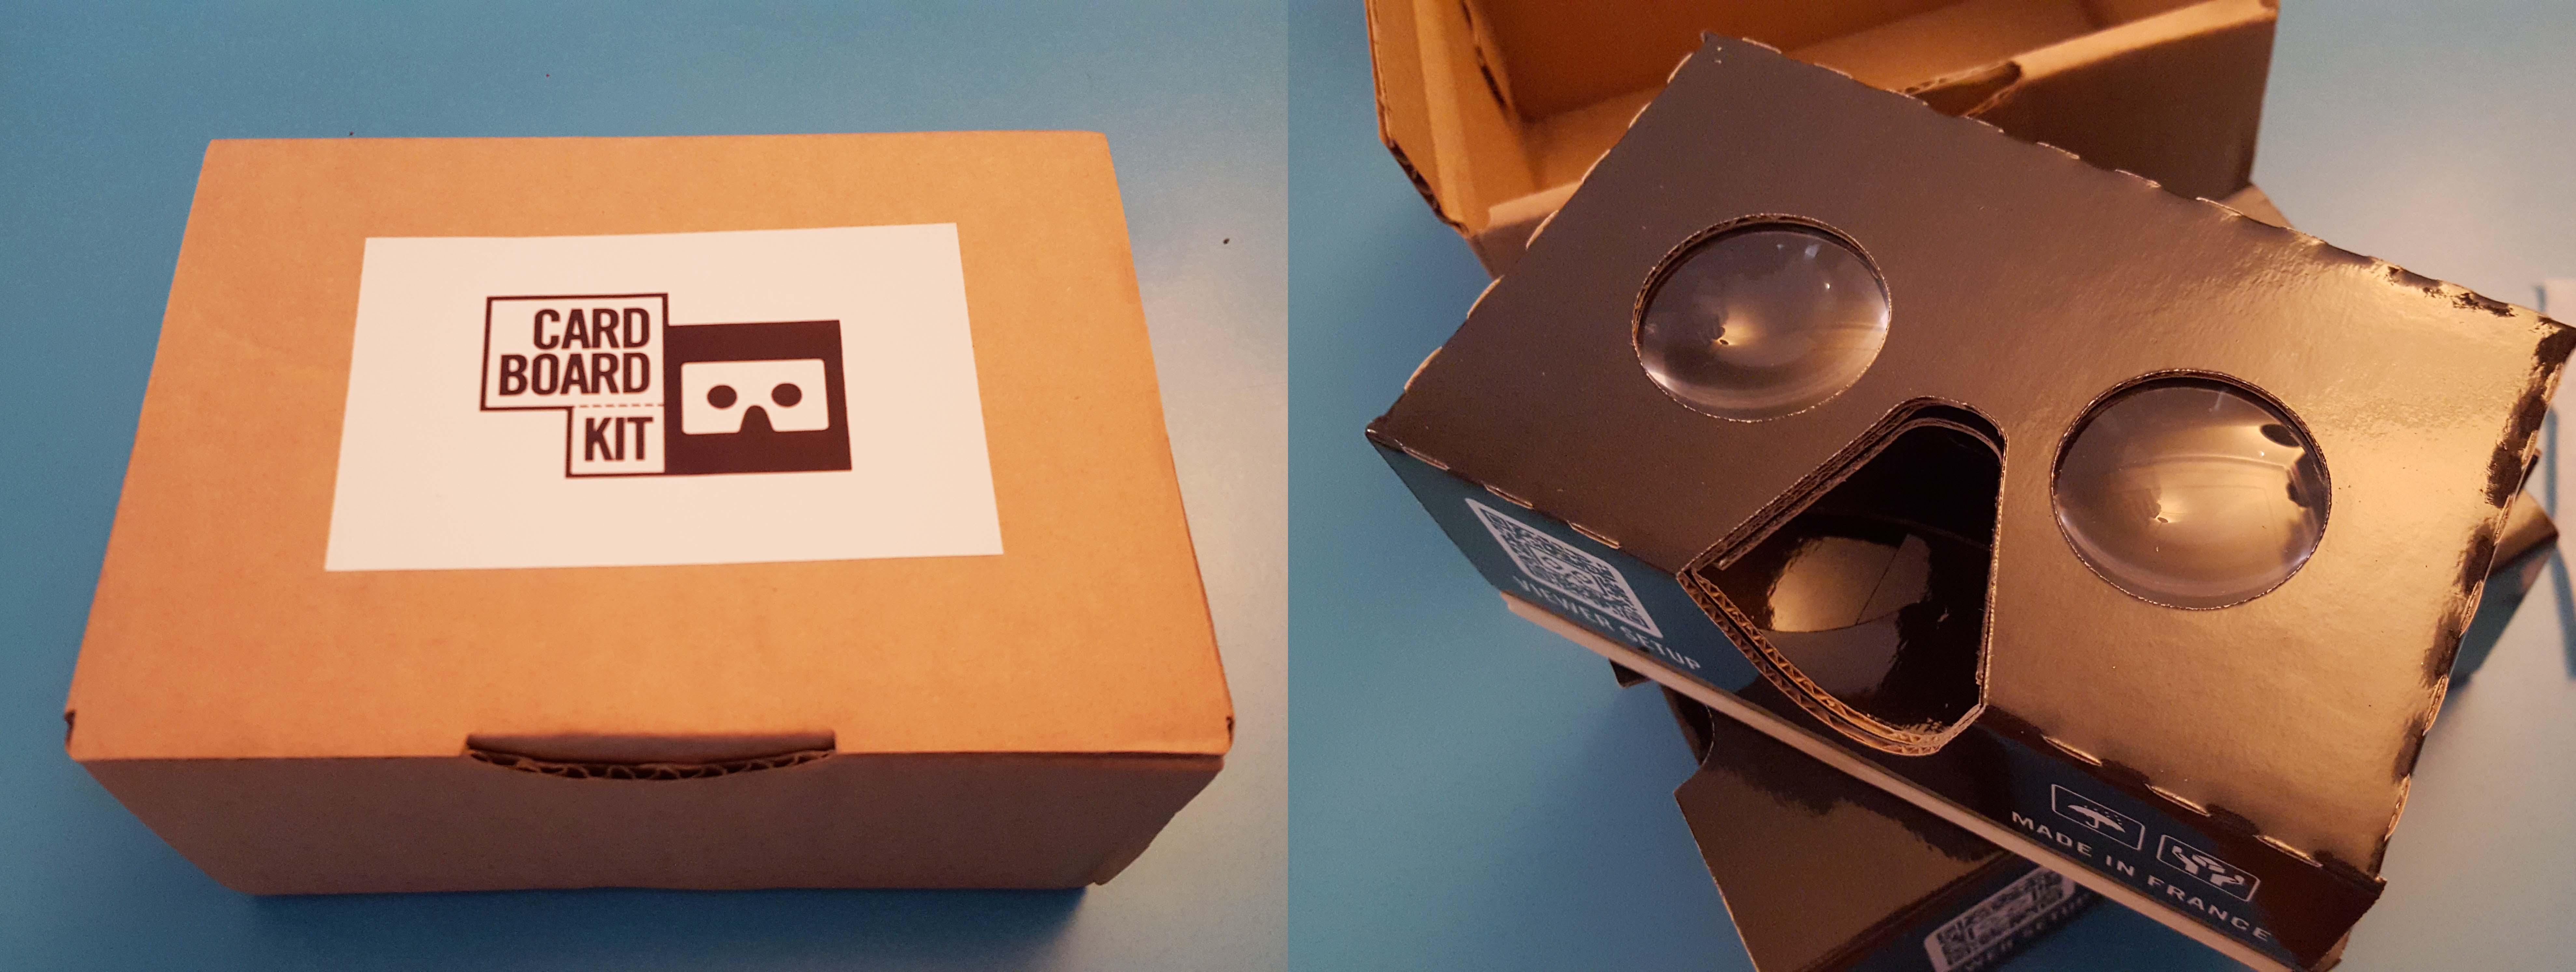 unpacking cardboard_2